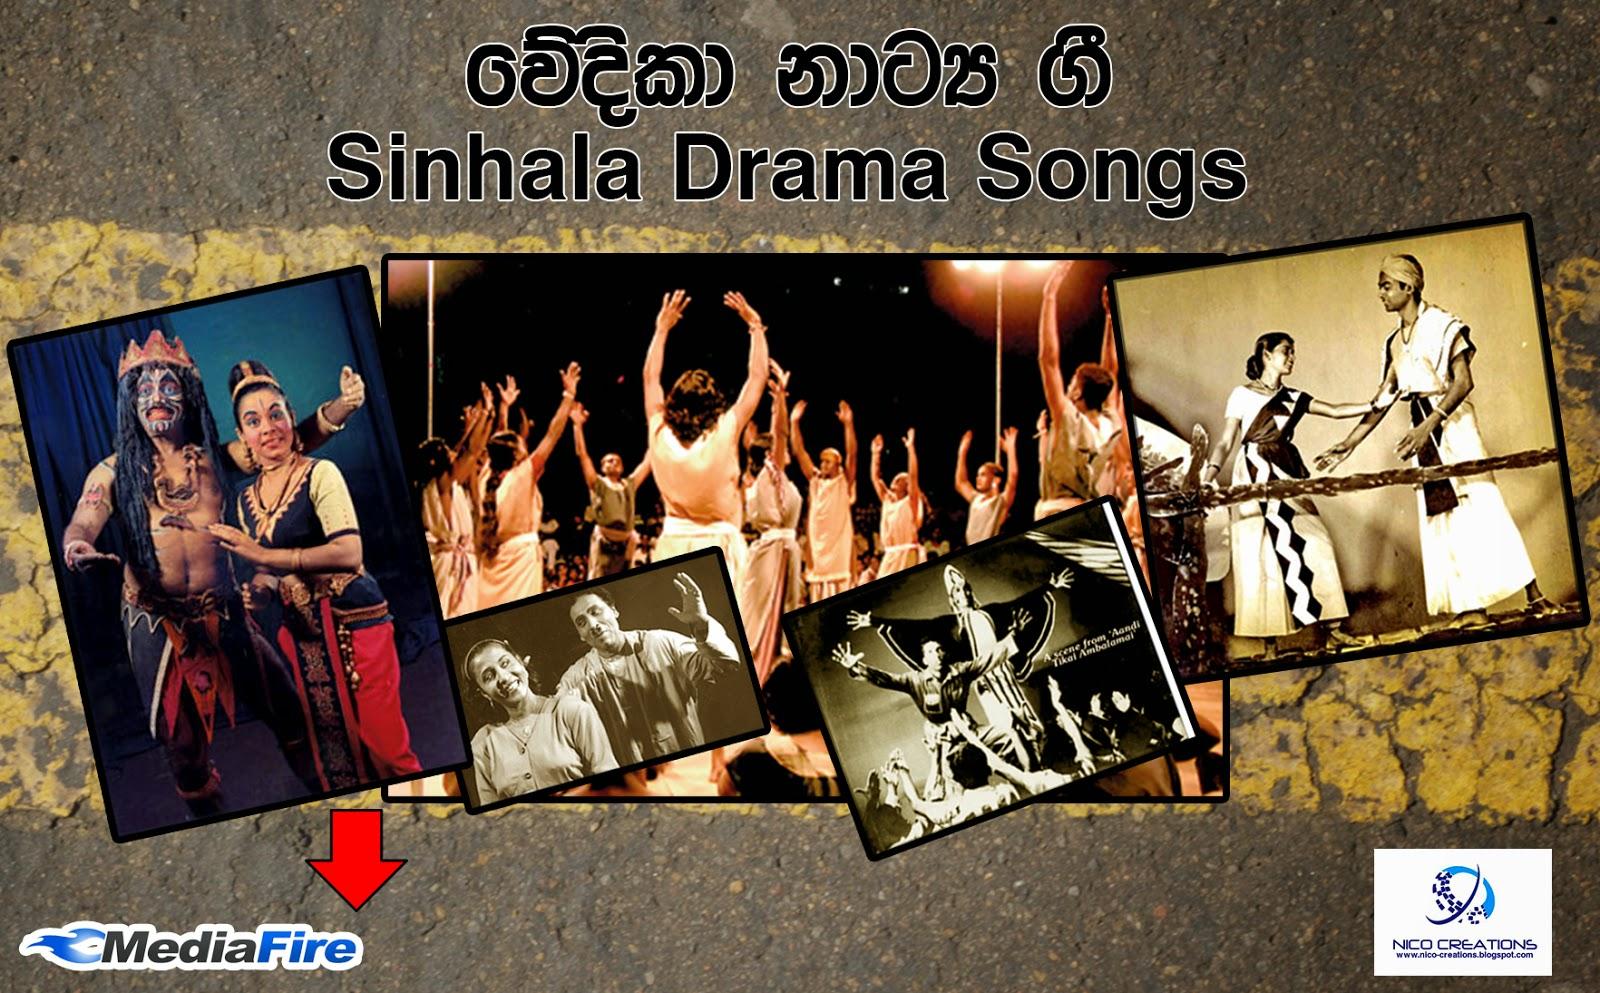 Sinhala drama download : Adventure time full episodes free youtube